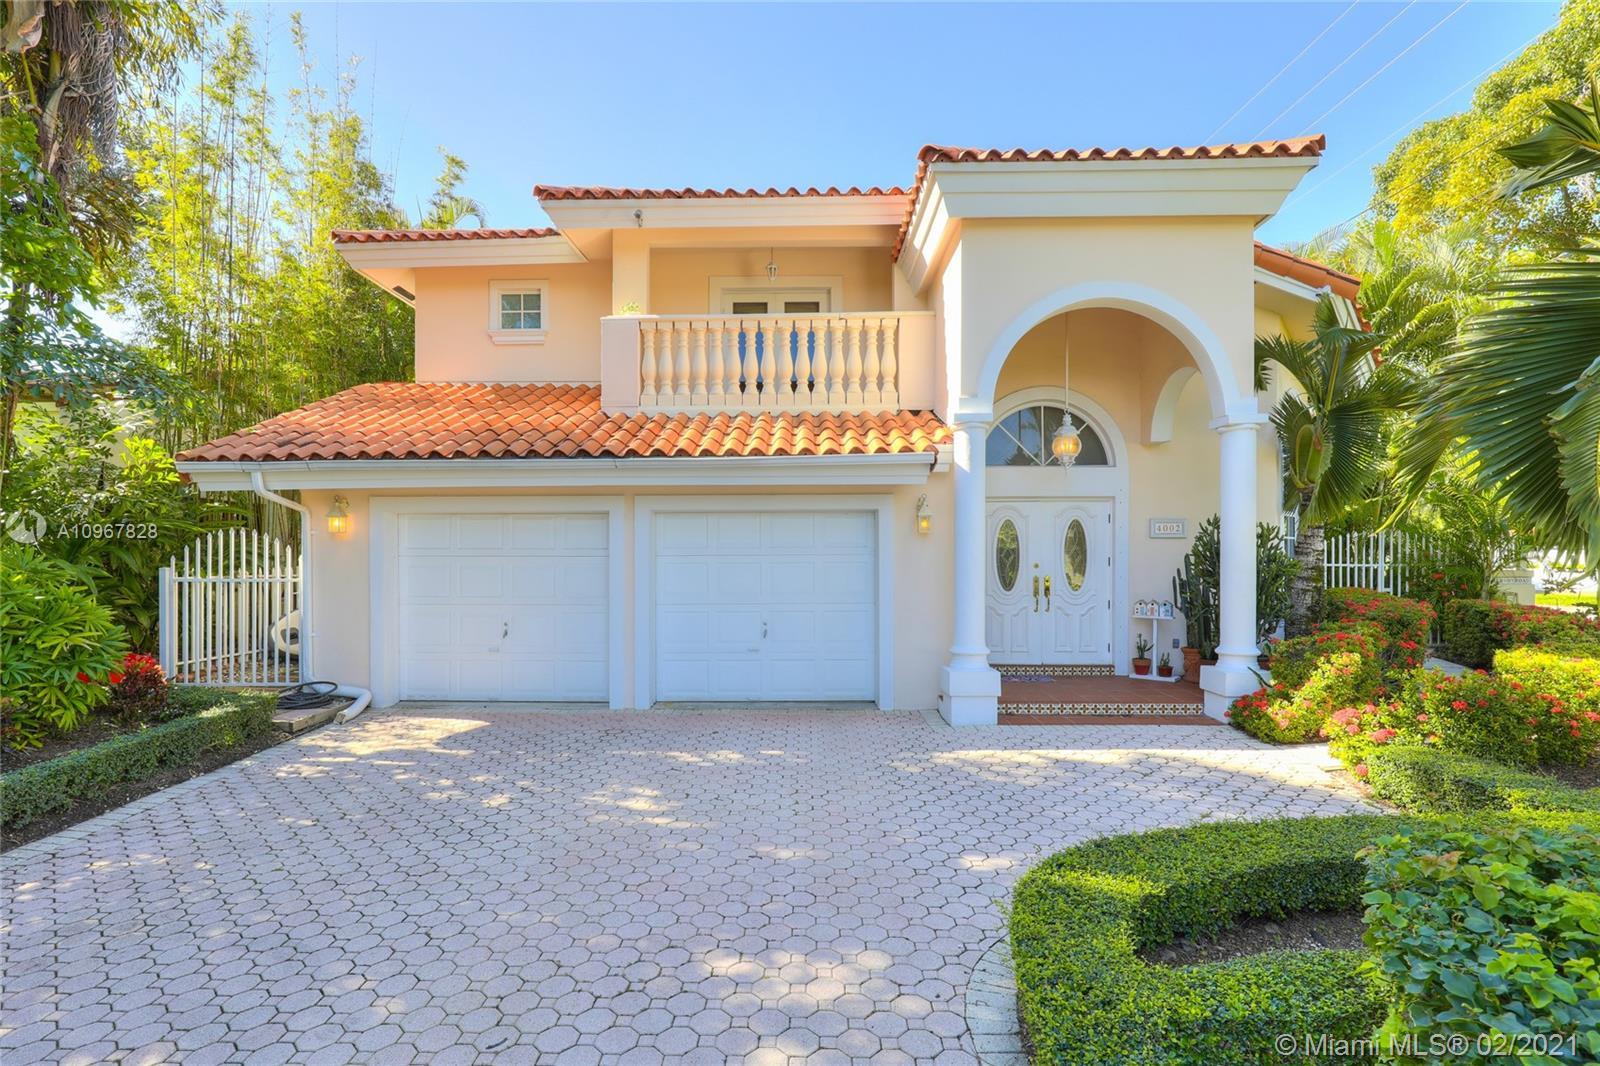 South Miami - 4002 Anderson Rd, Coral Gables, FL 33146